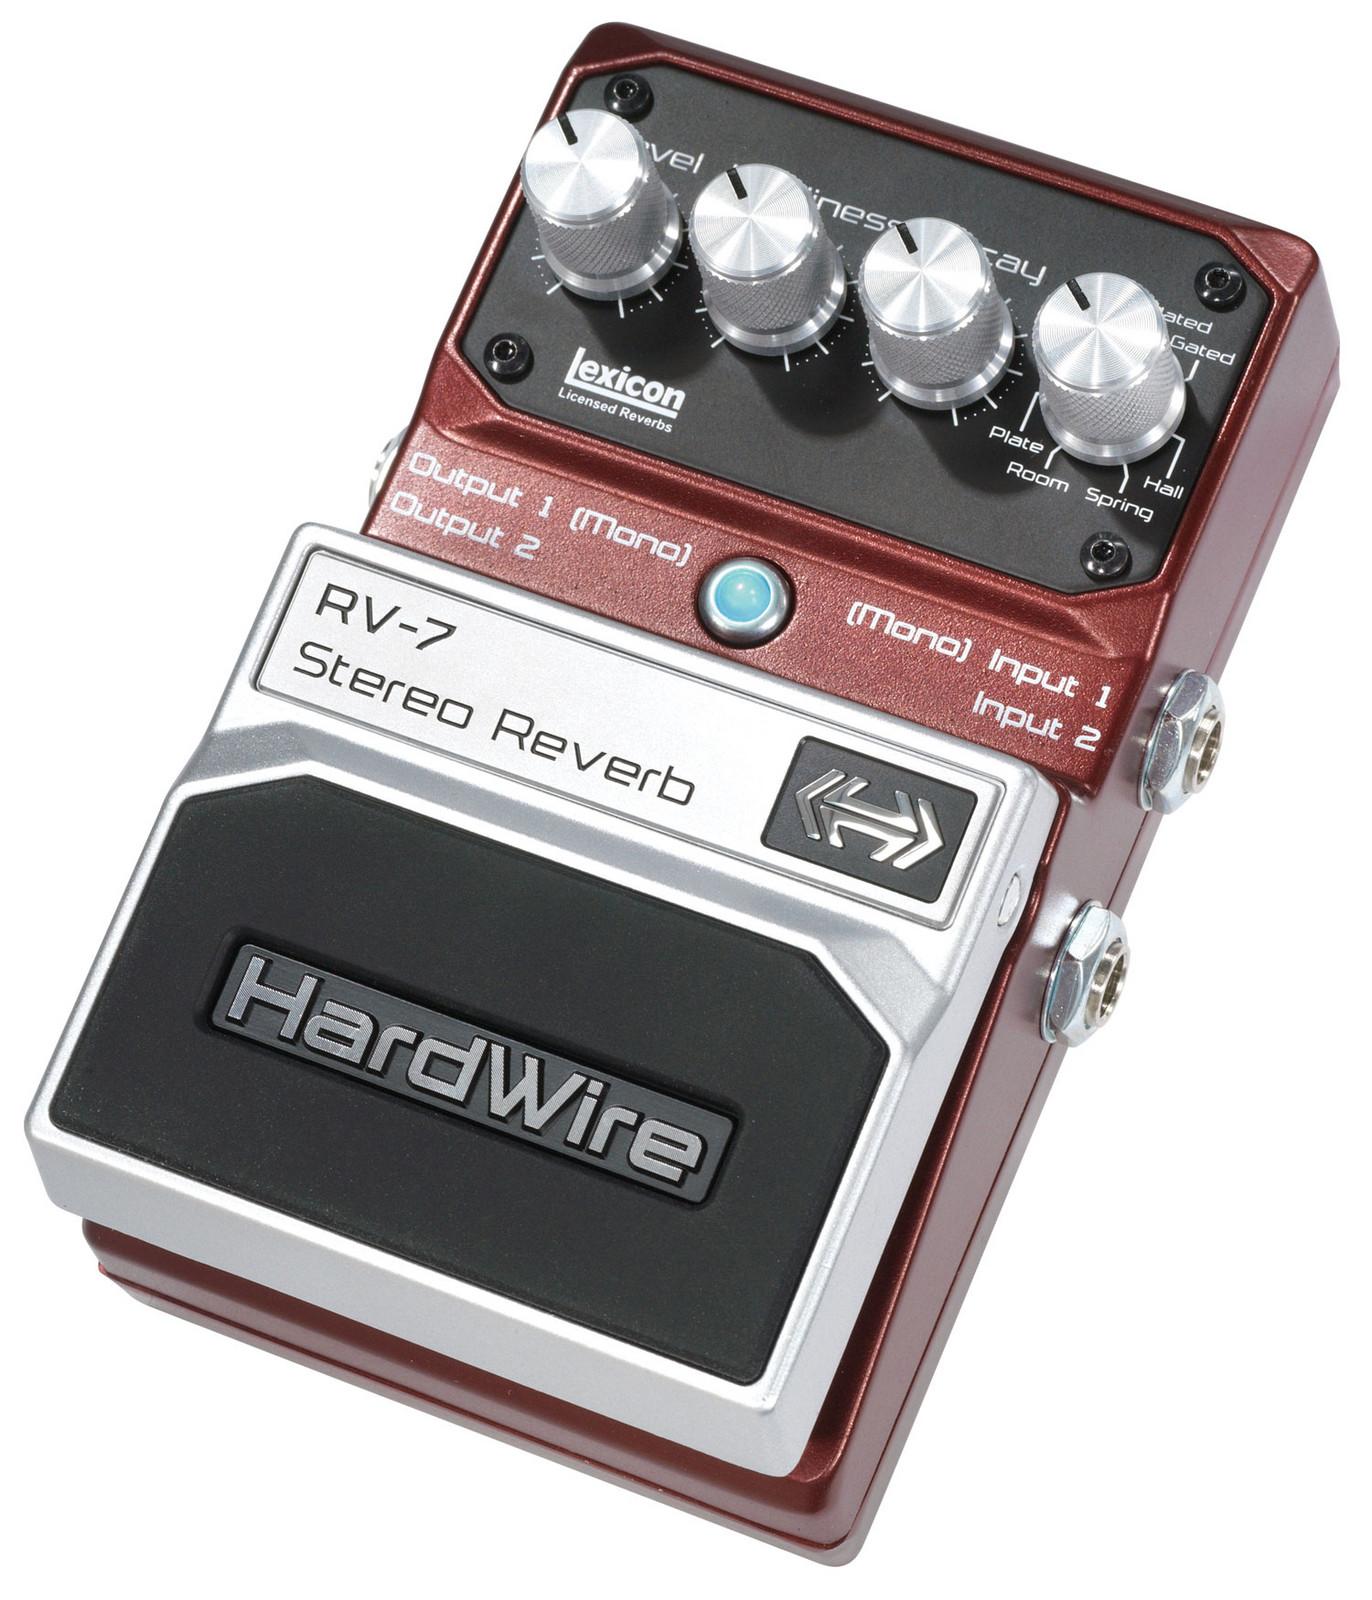 hardwire_rv7.jpg